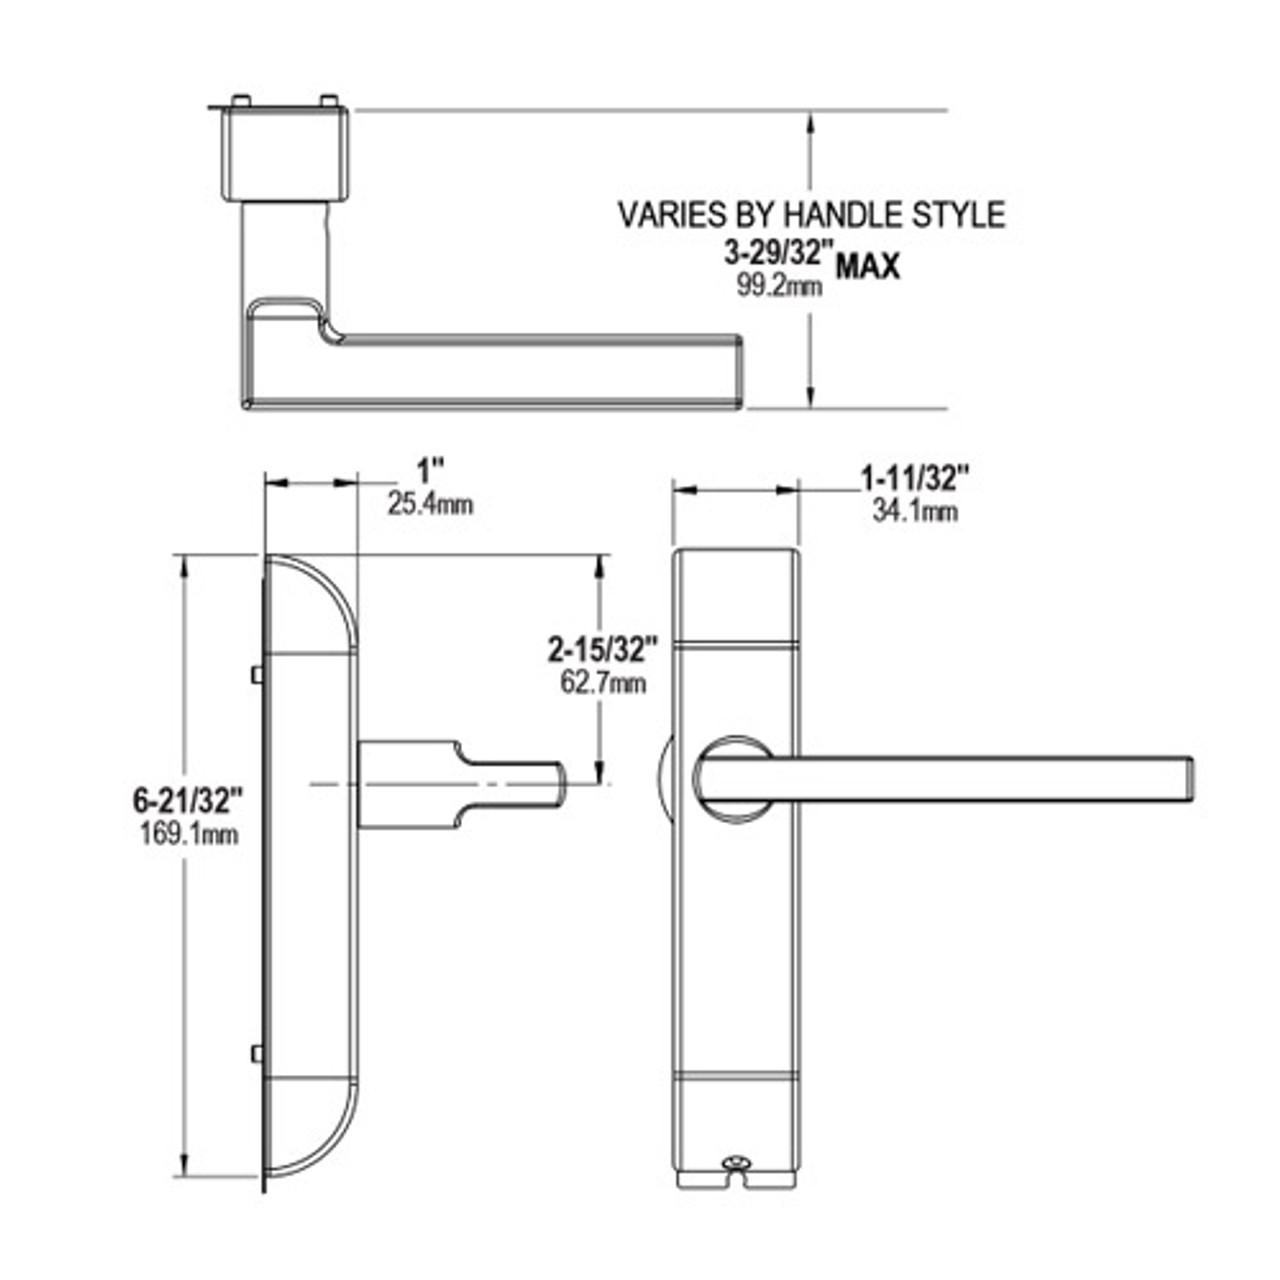 4600-MW-641-US4 Adams Rite MW Designer handle Dimensional View